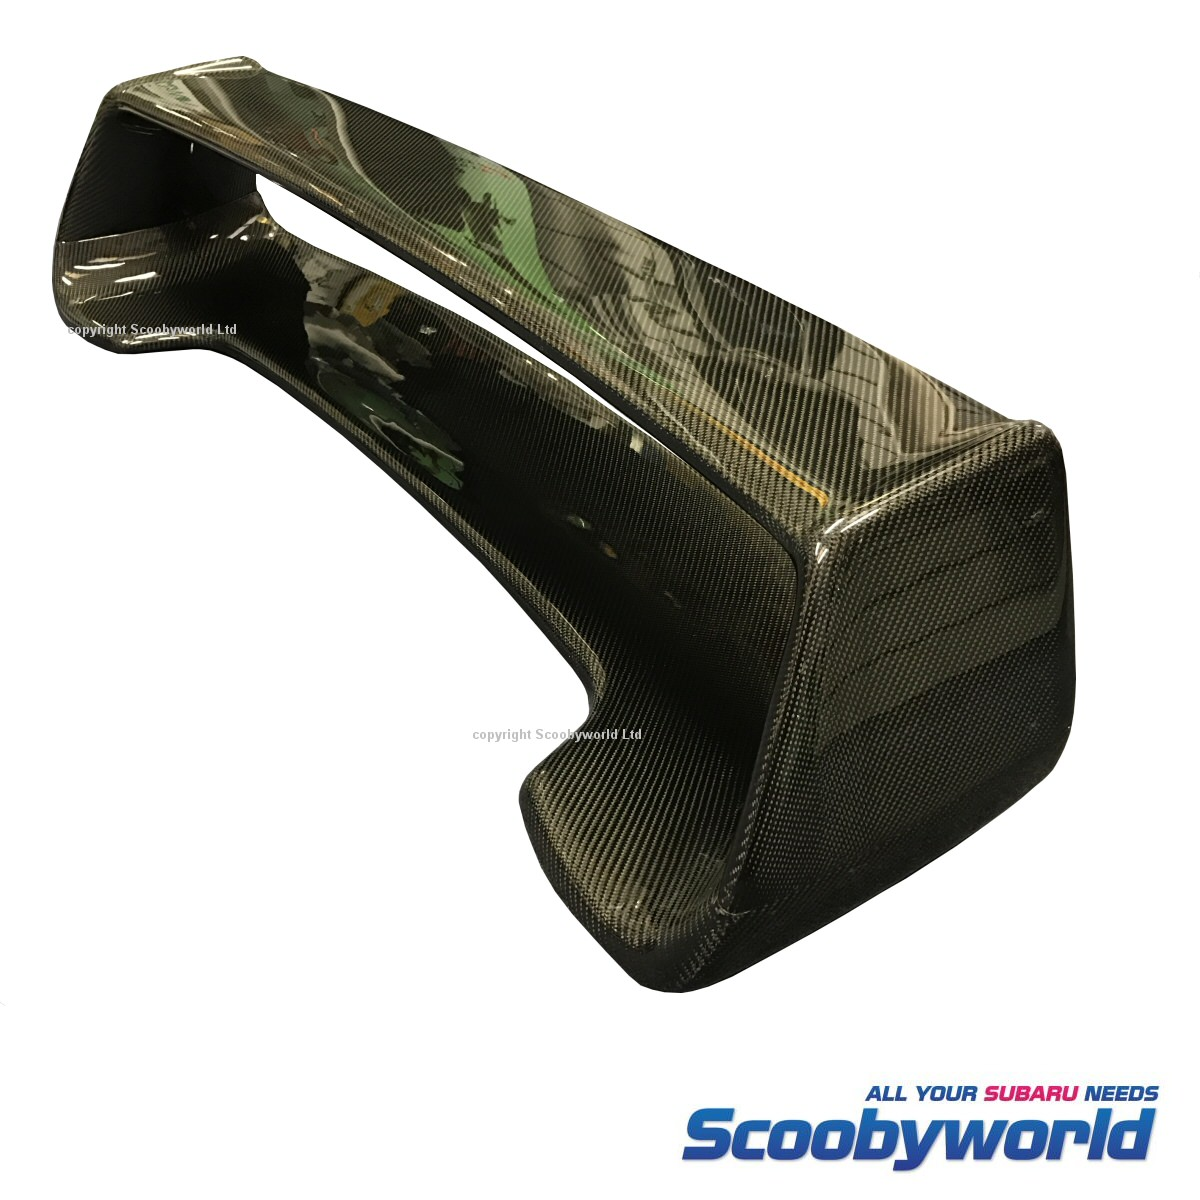 Rear Wings | Subaru WRX STI Performance Parts | Scoobyworld